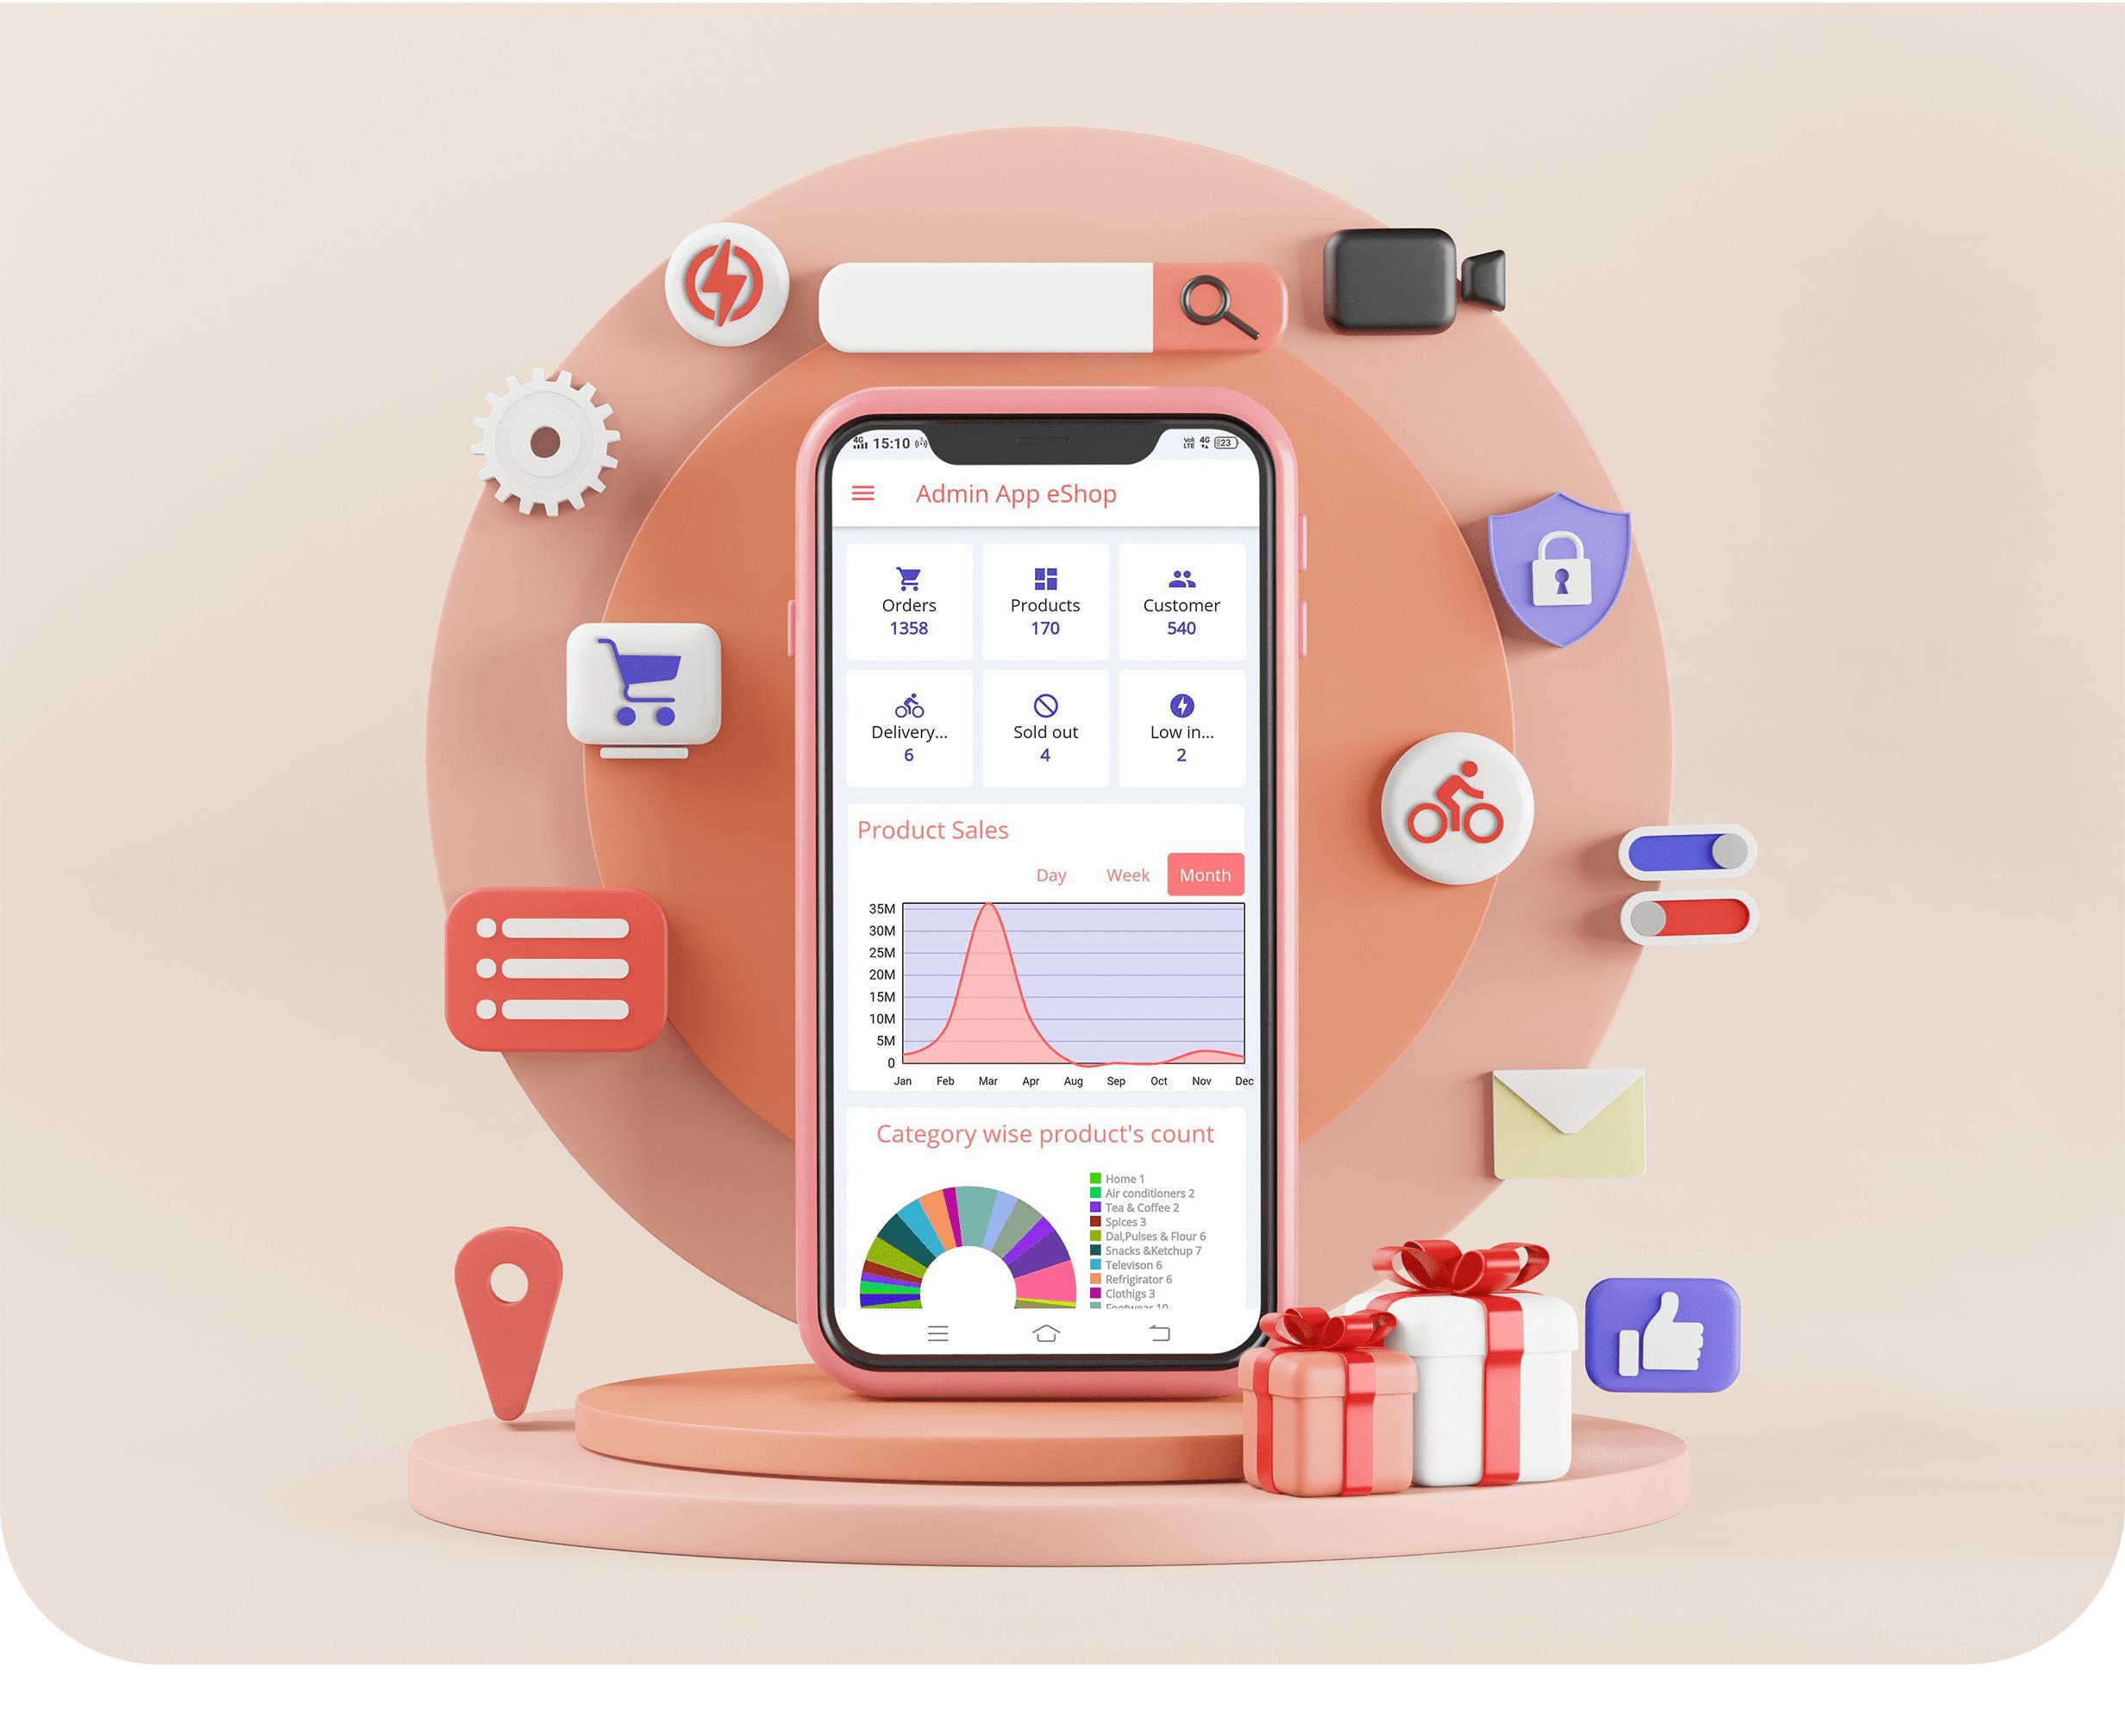 eShop - Ecommerce Admin / Store Manager app - 1